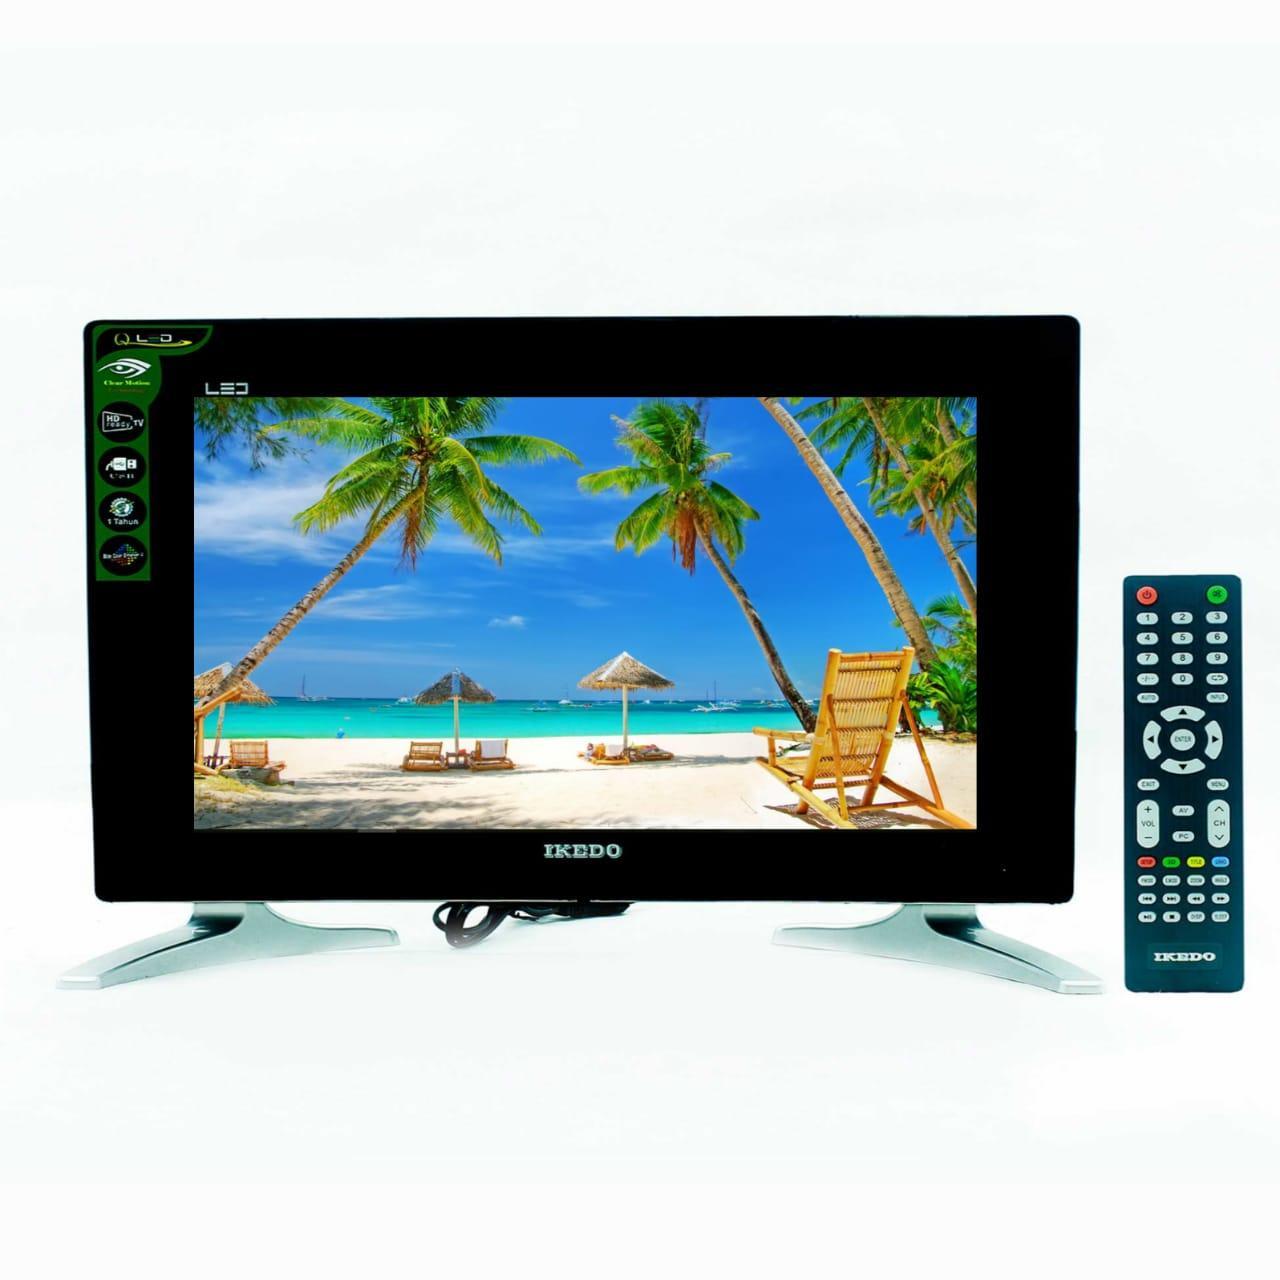 TV LED IKEDO LT-24Q1-W FULL HD DISPLAY MURAH TERBARU